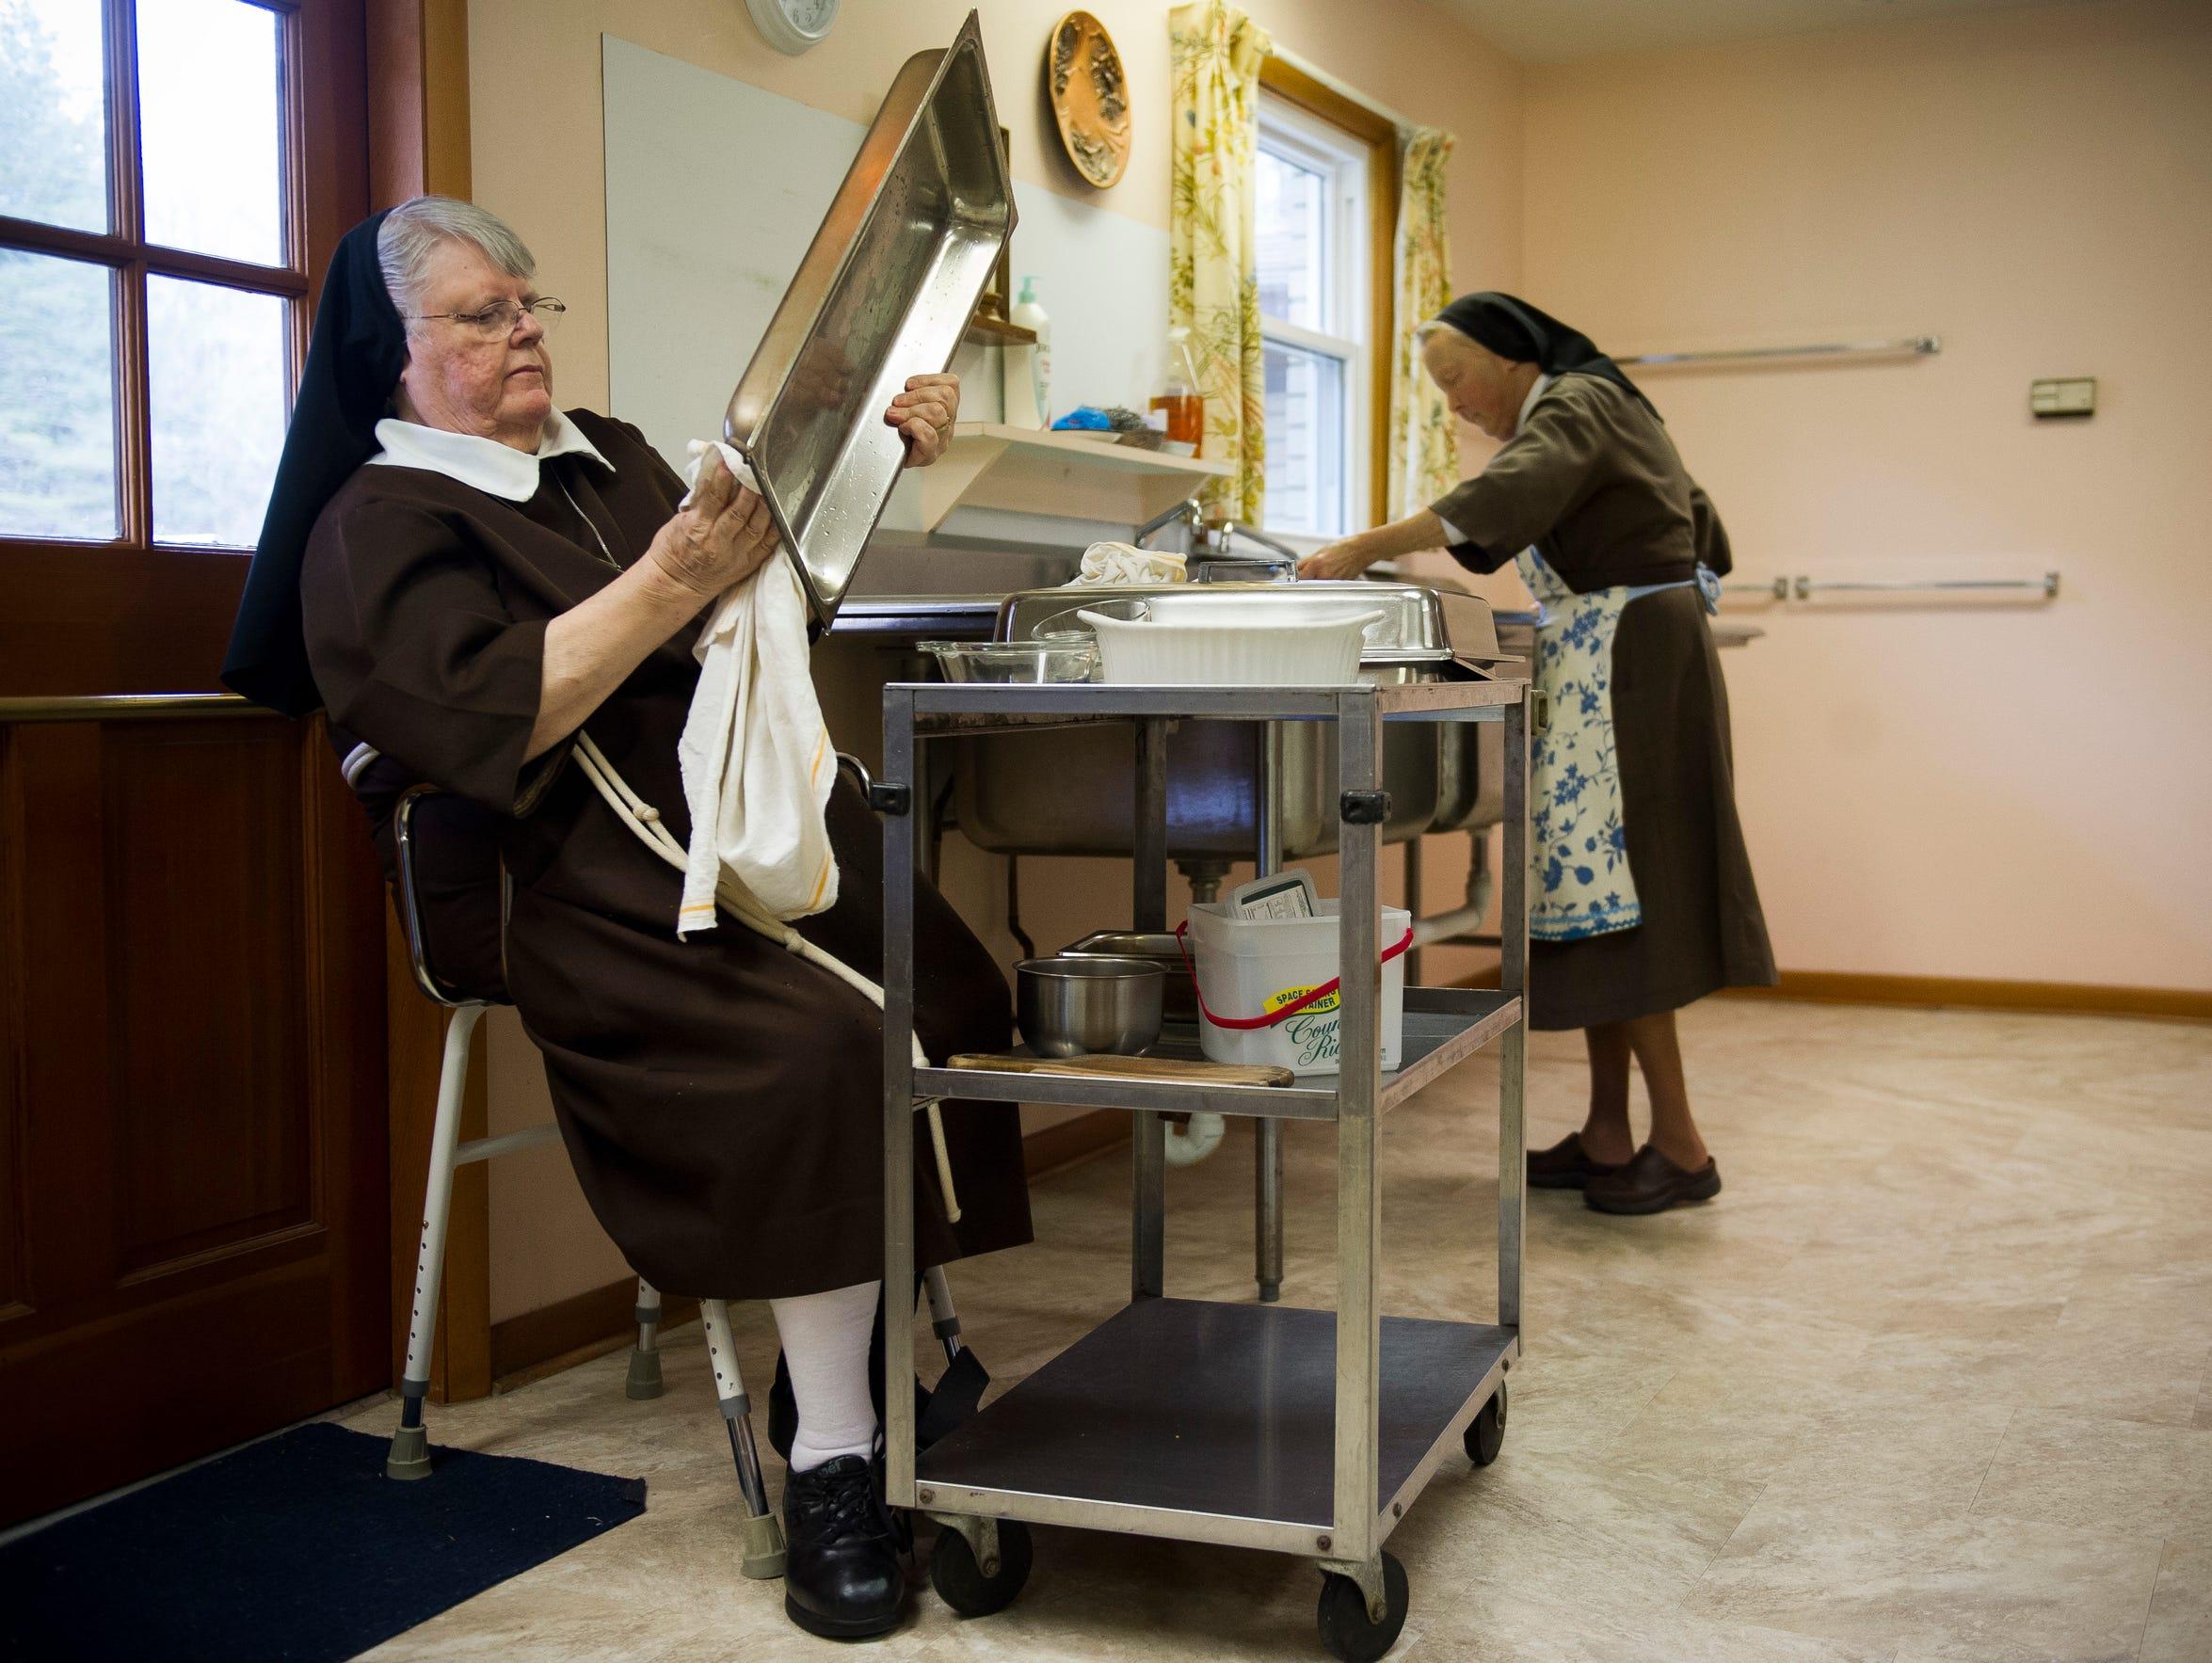 Sister Mary Veronica Jonkier, left, and Sister Jeanne